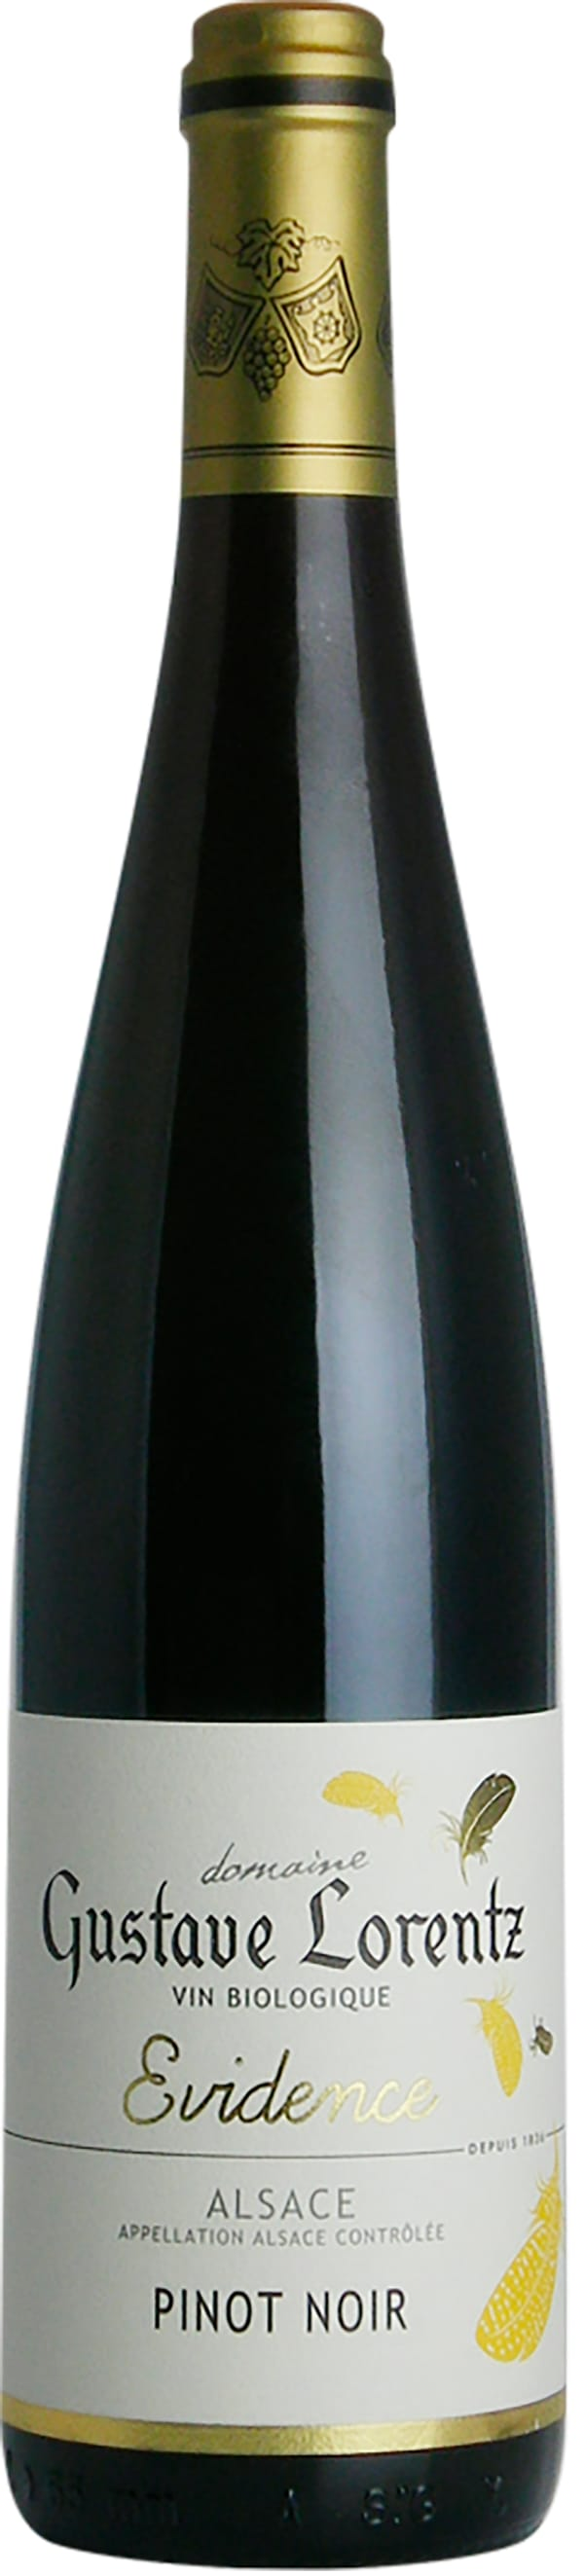 Gustave Lorentz Évidence Pinot Noir  2016